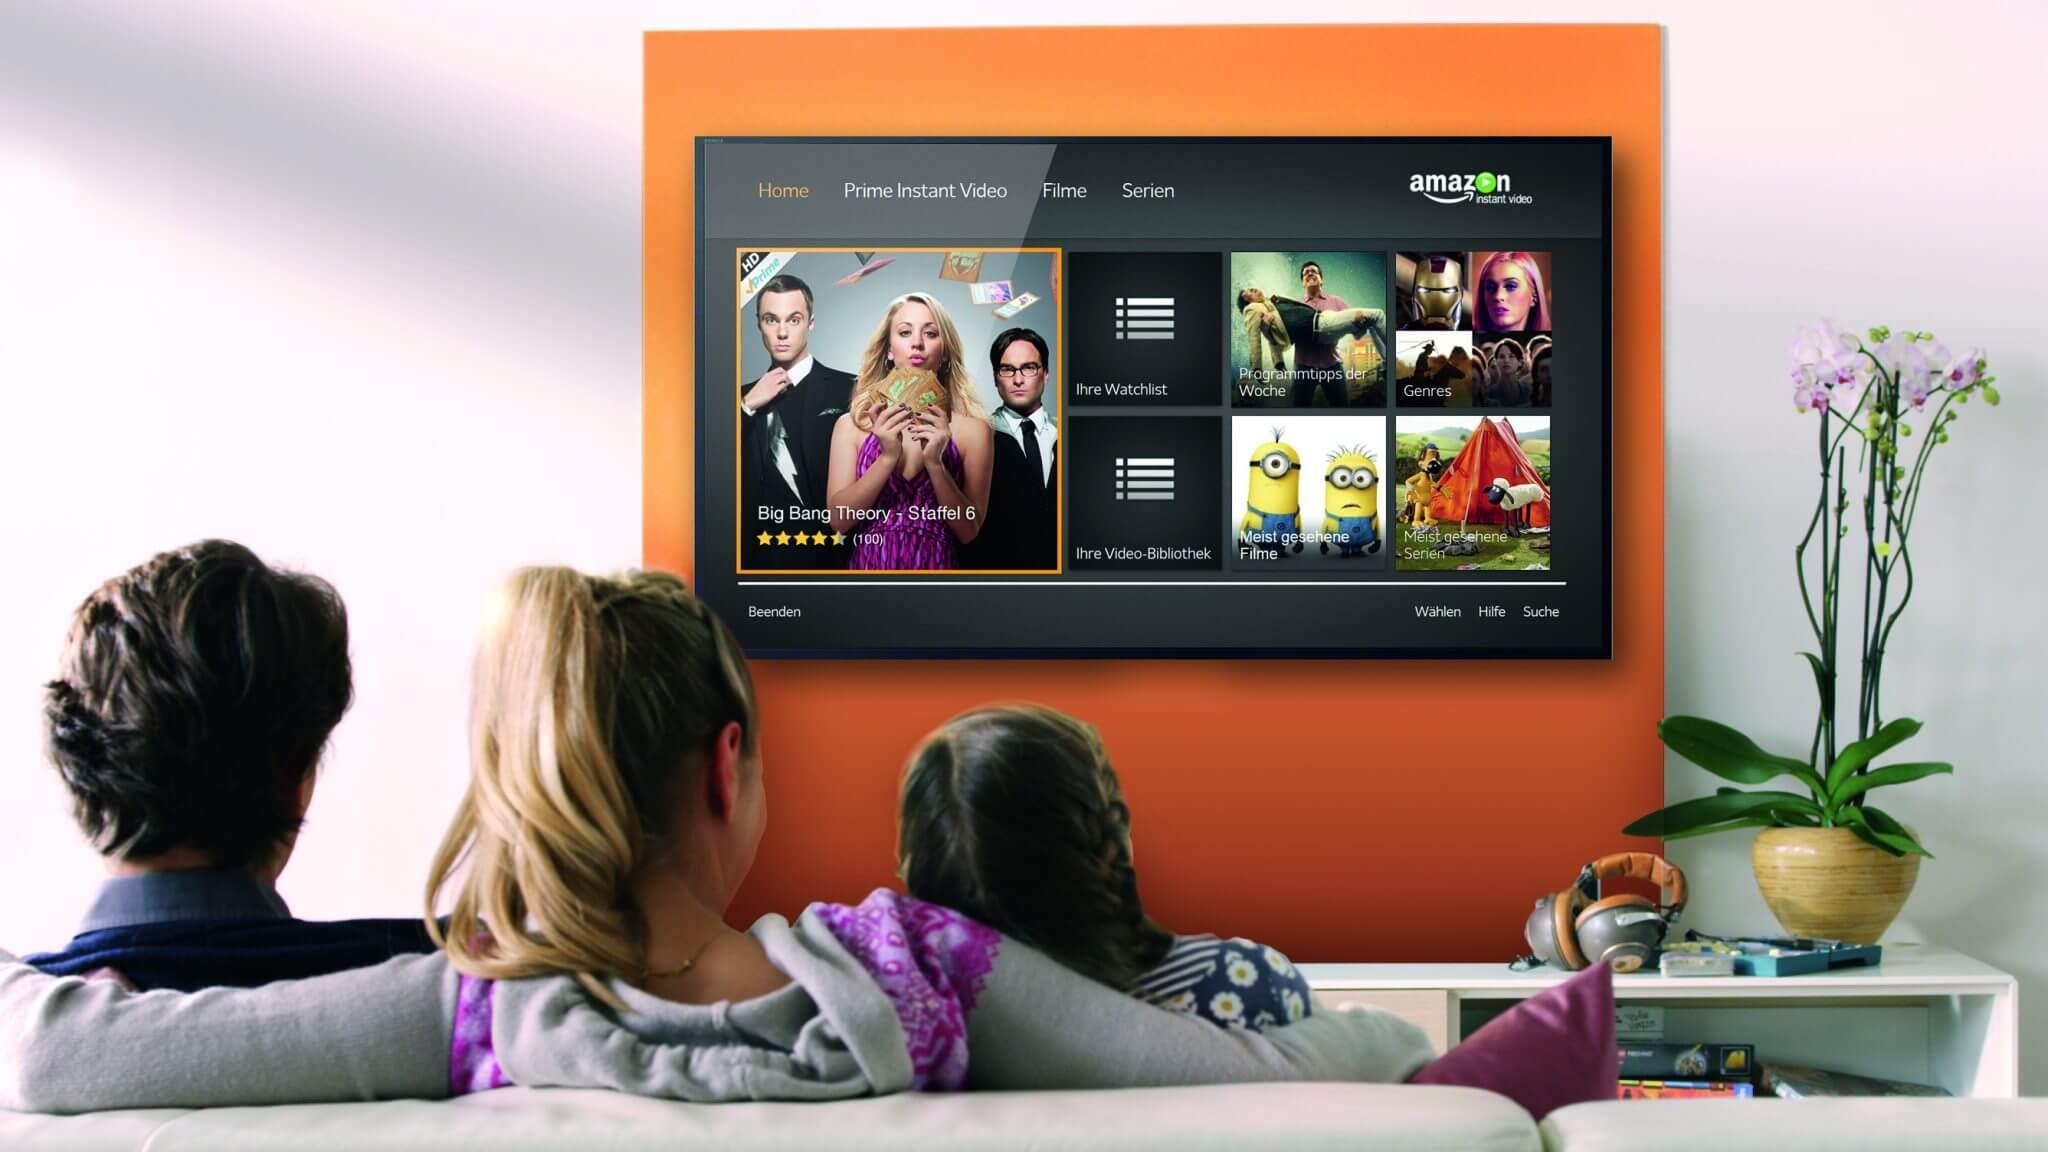 smt amazon capa - Amazon lança serviço de streaming mensal para rivalizar com a Netflix